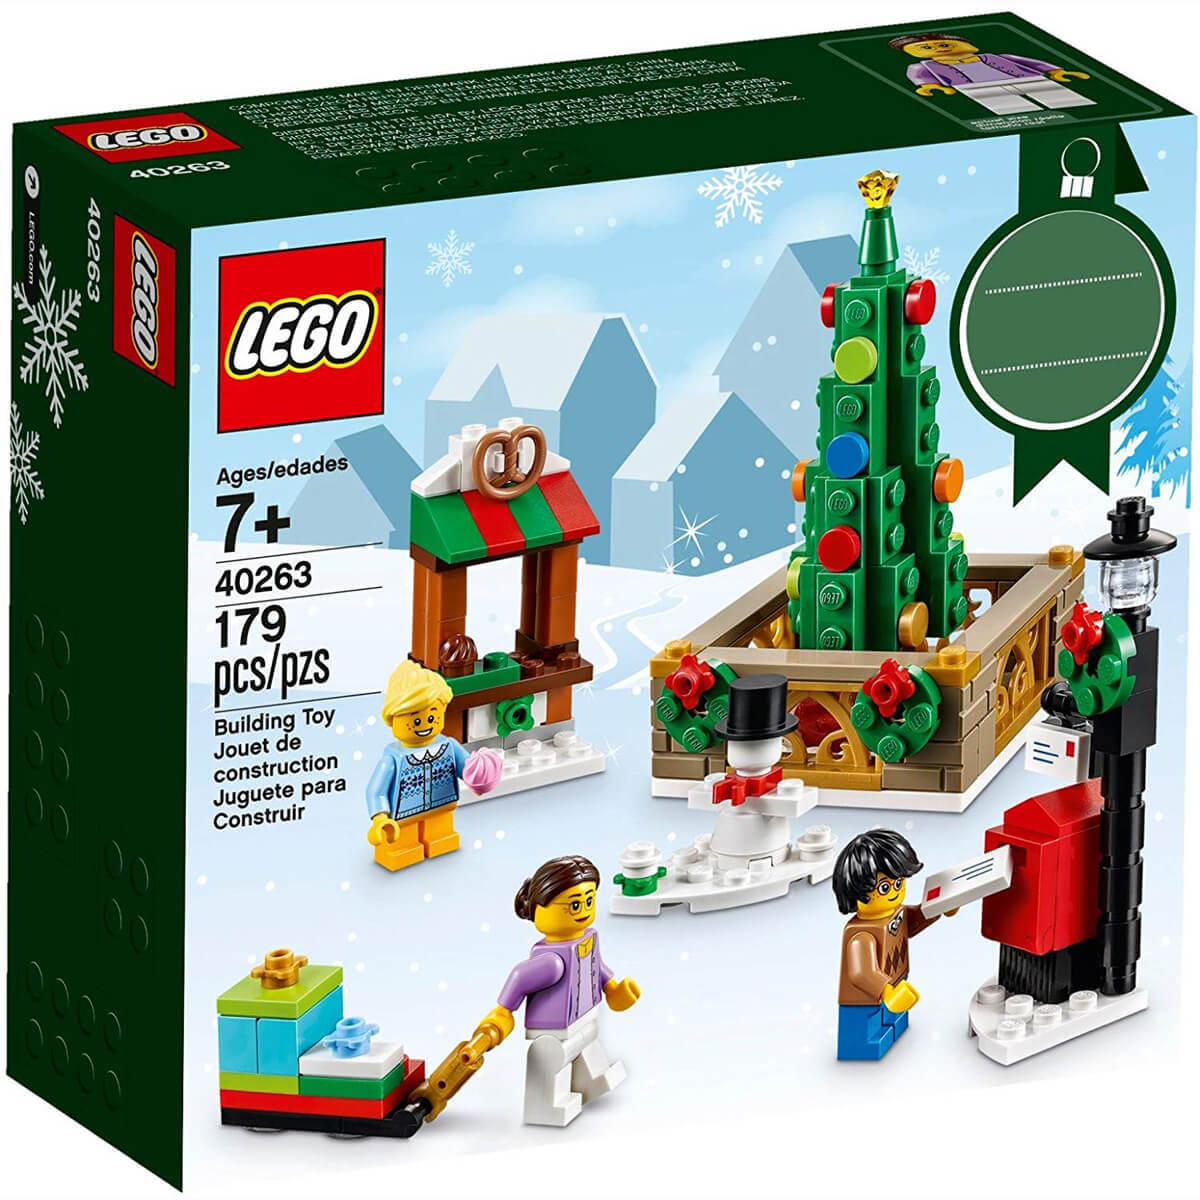 Lego Christmas.Lego Christmas Town Square 40263